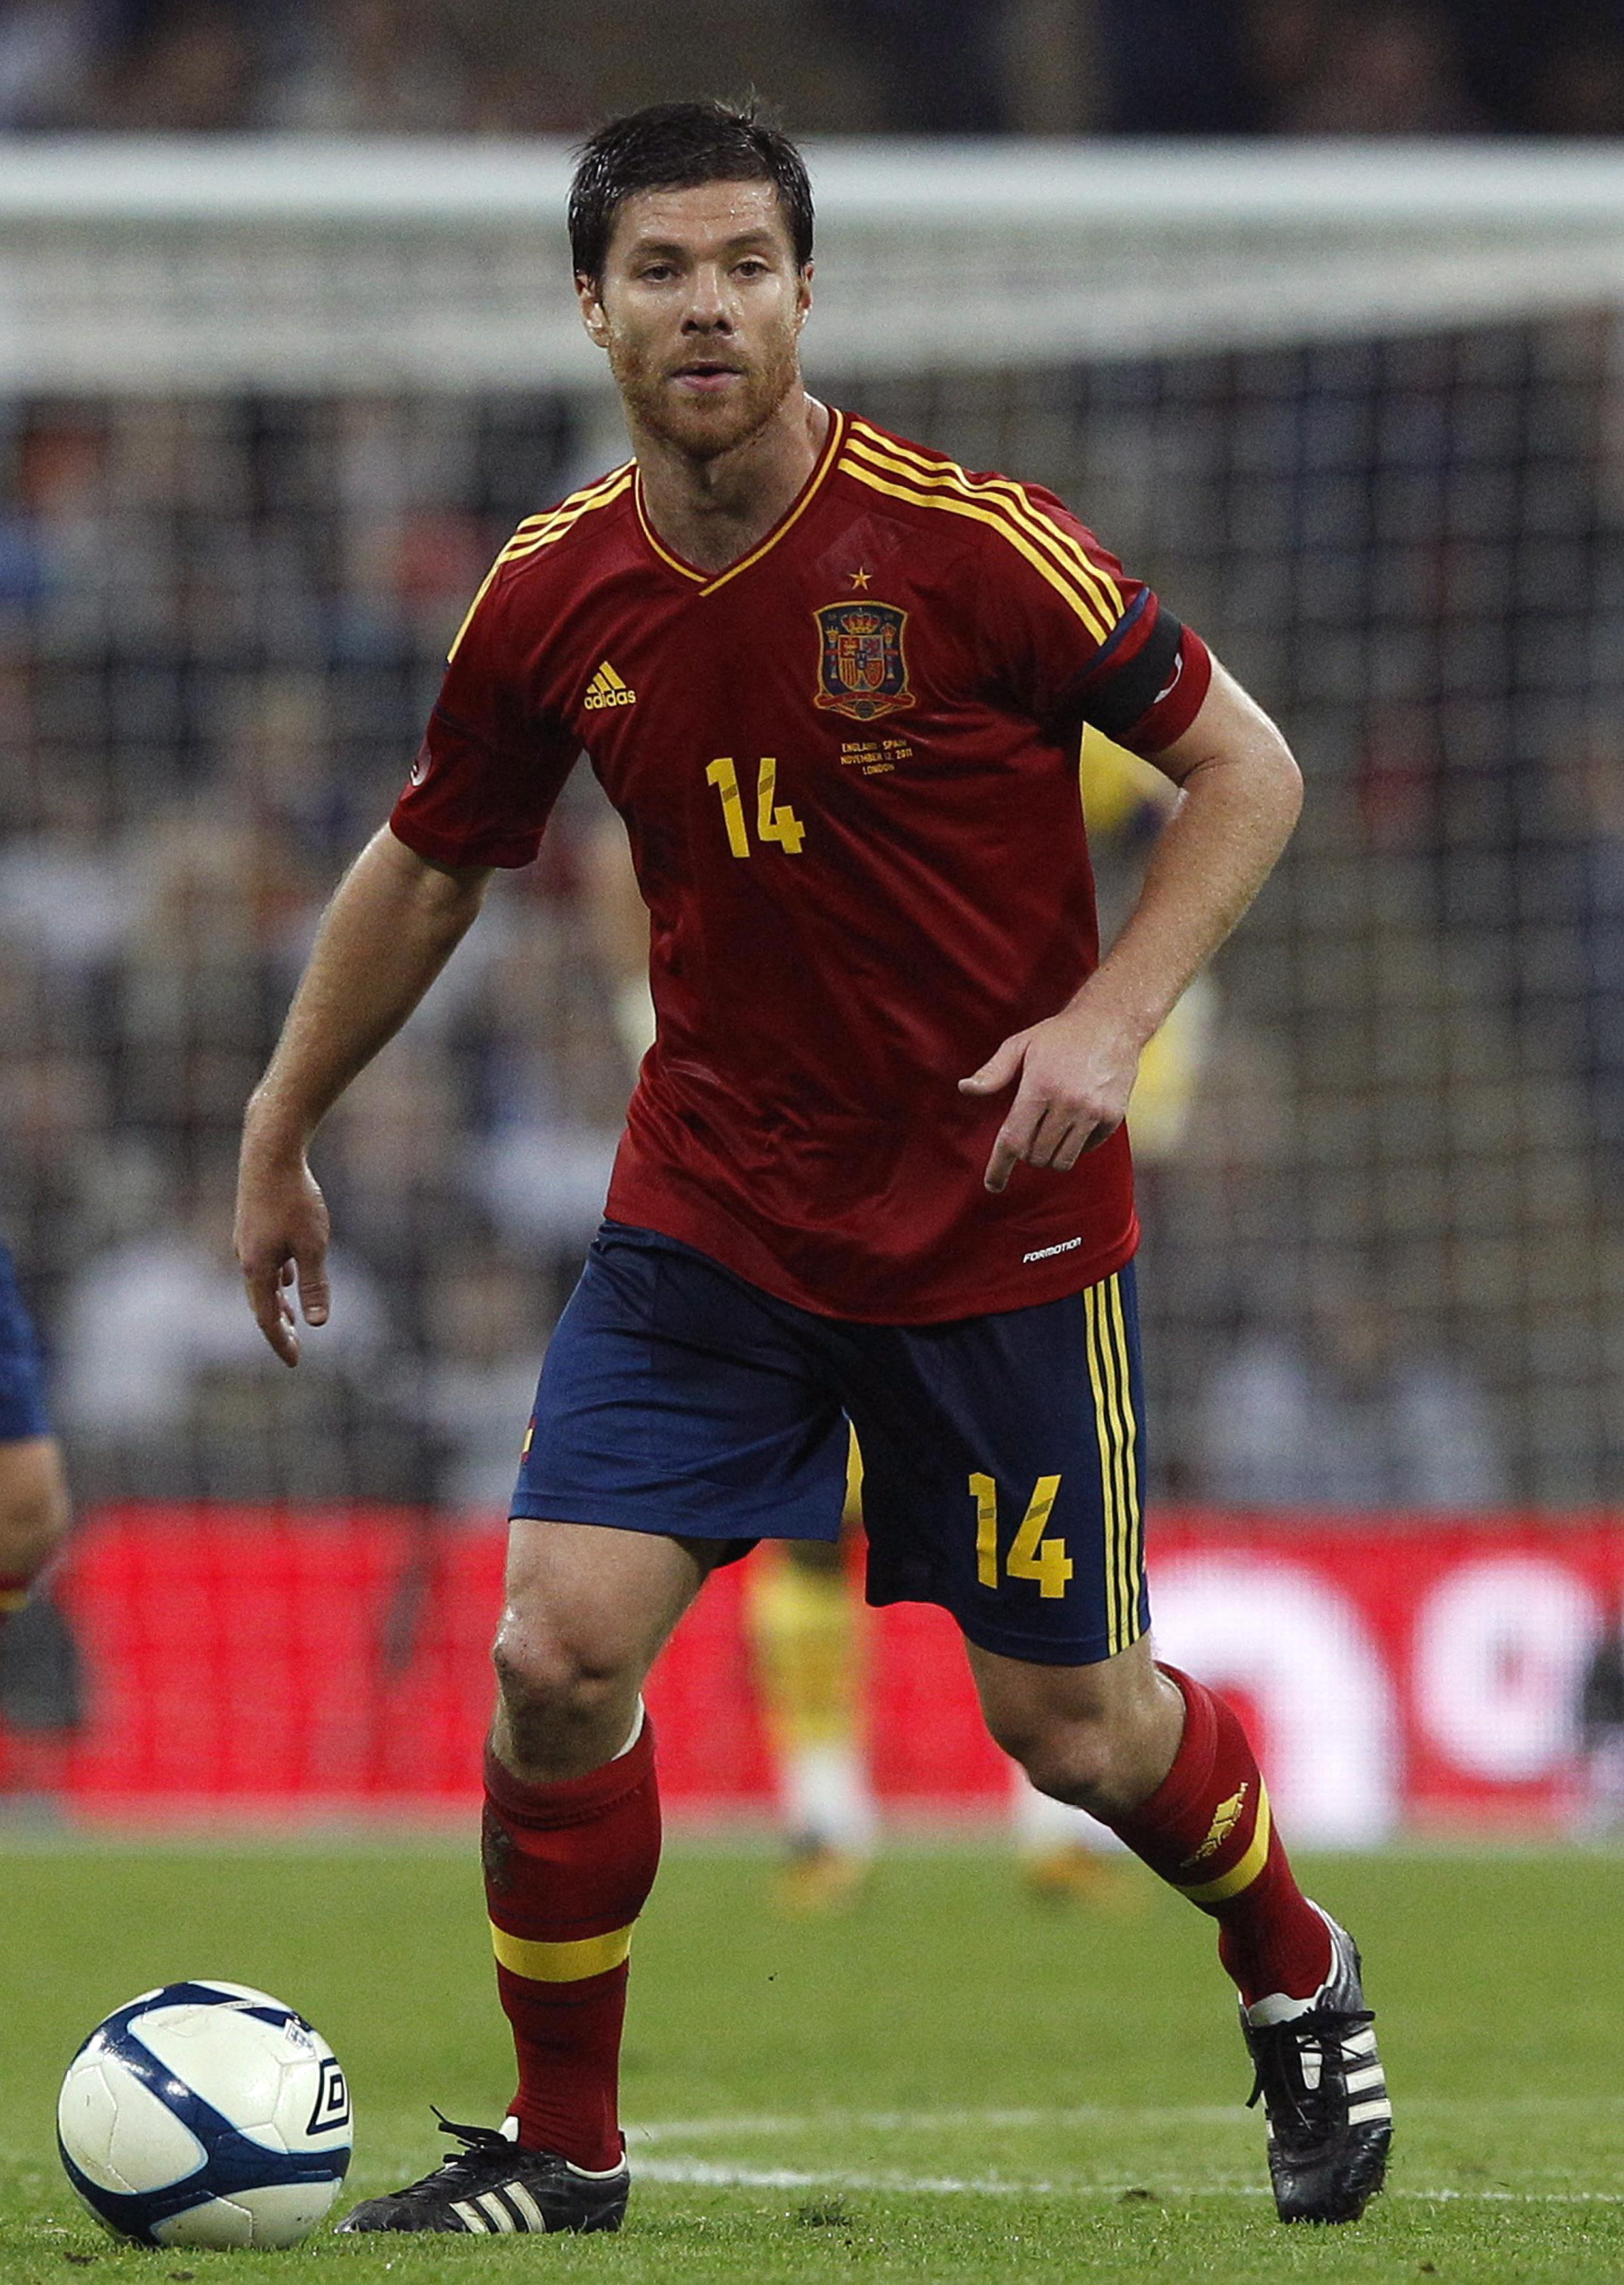 Xabi facing Alonso BayRadio fine €4m fraud tax for Footballer